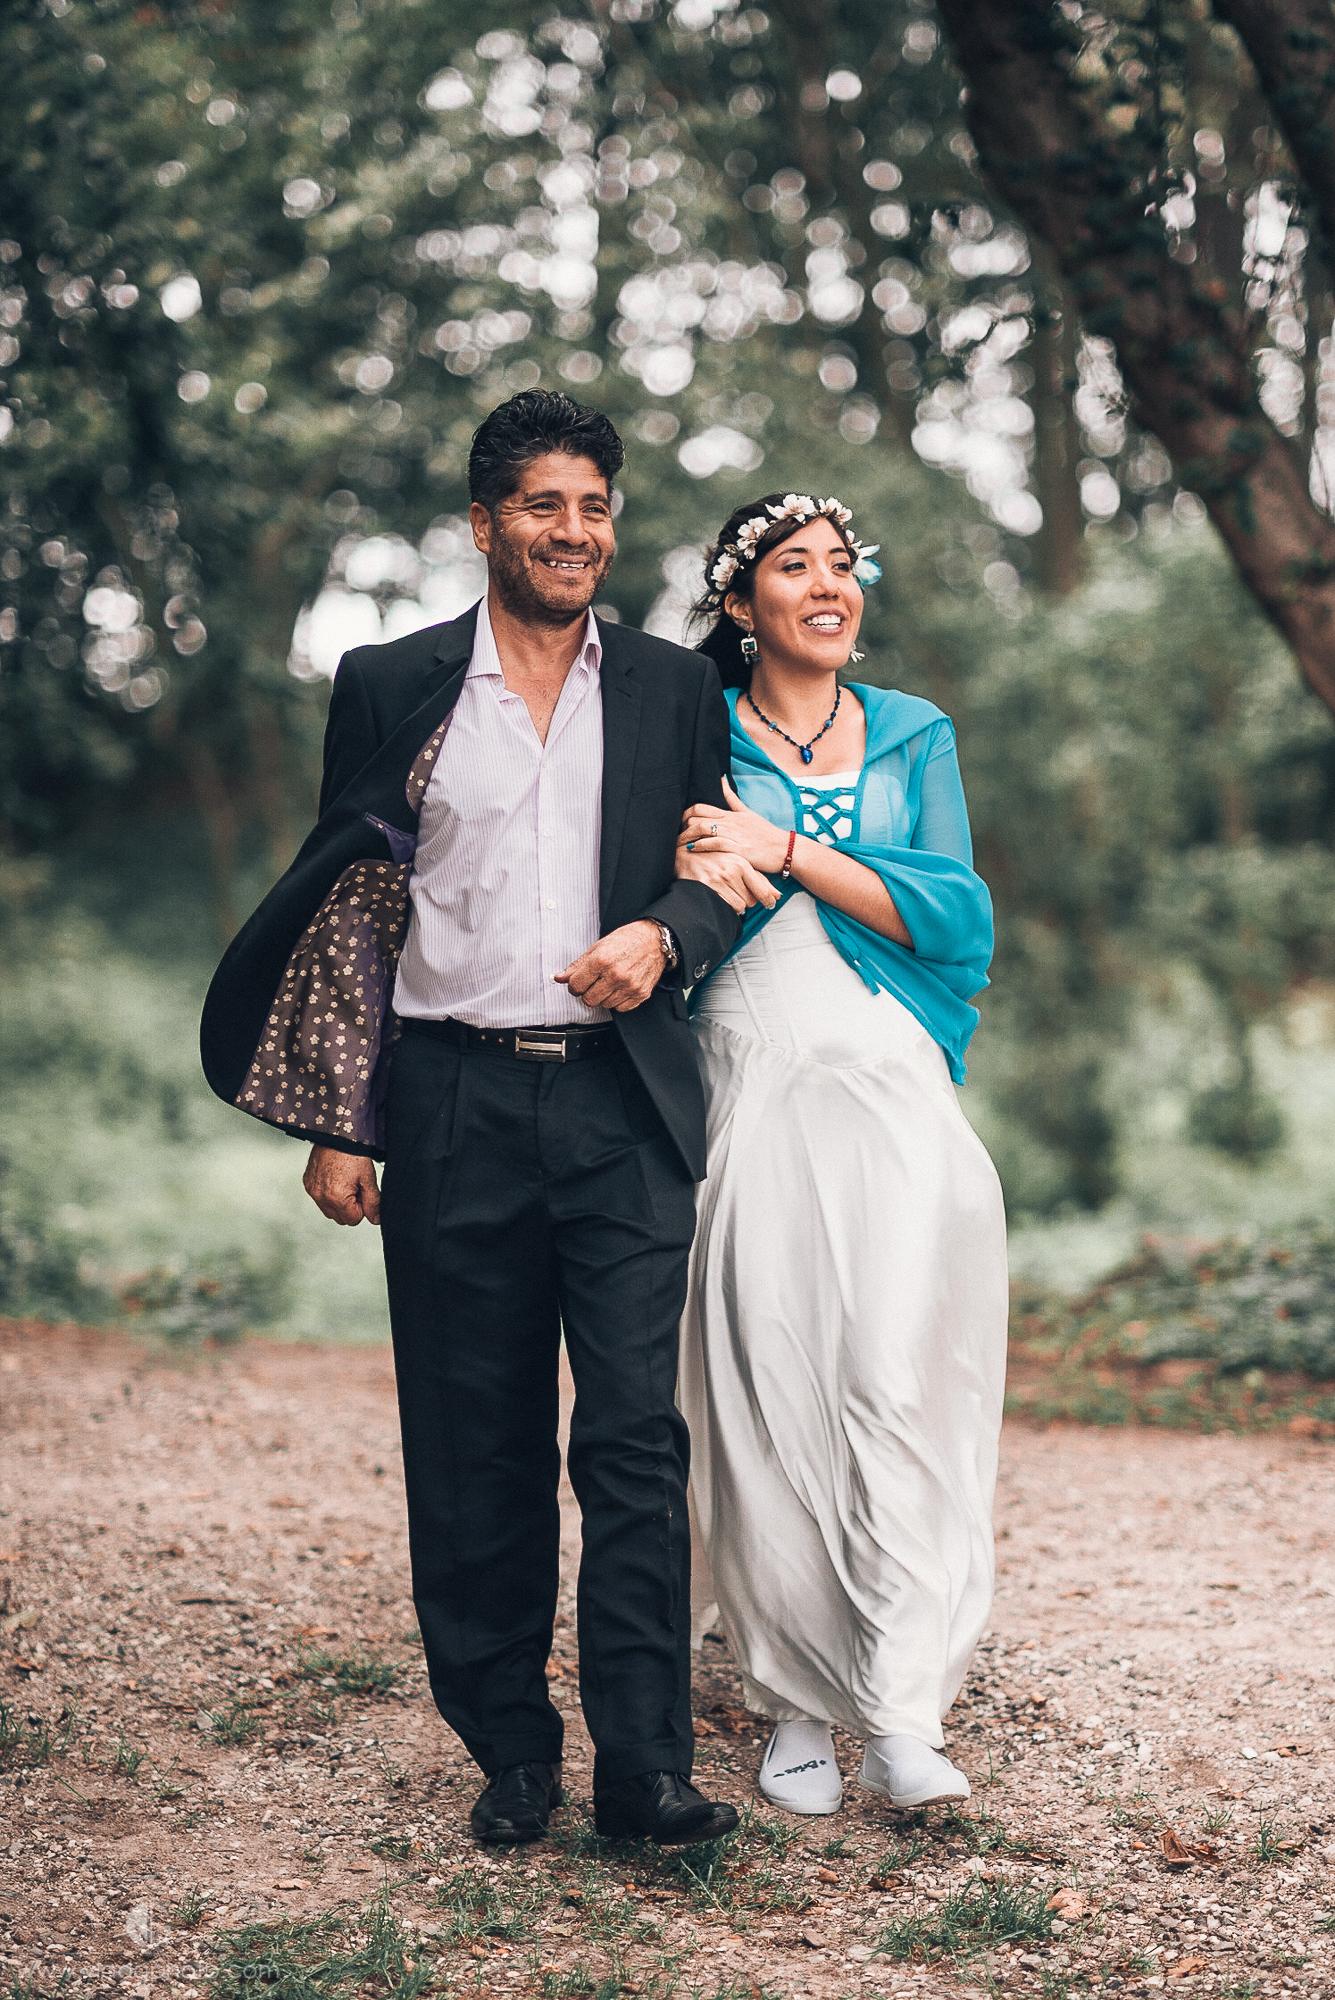 Romantic Forest Wedding Photography Denmark_10.jpg